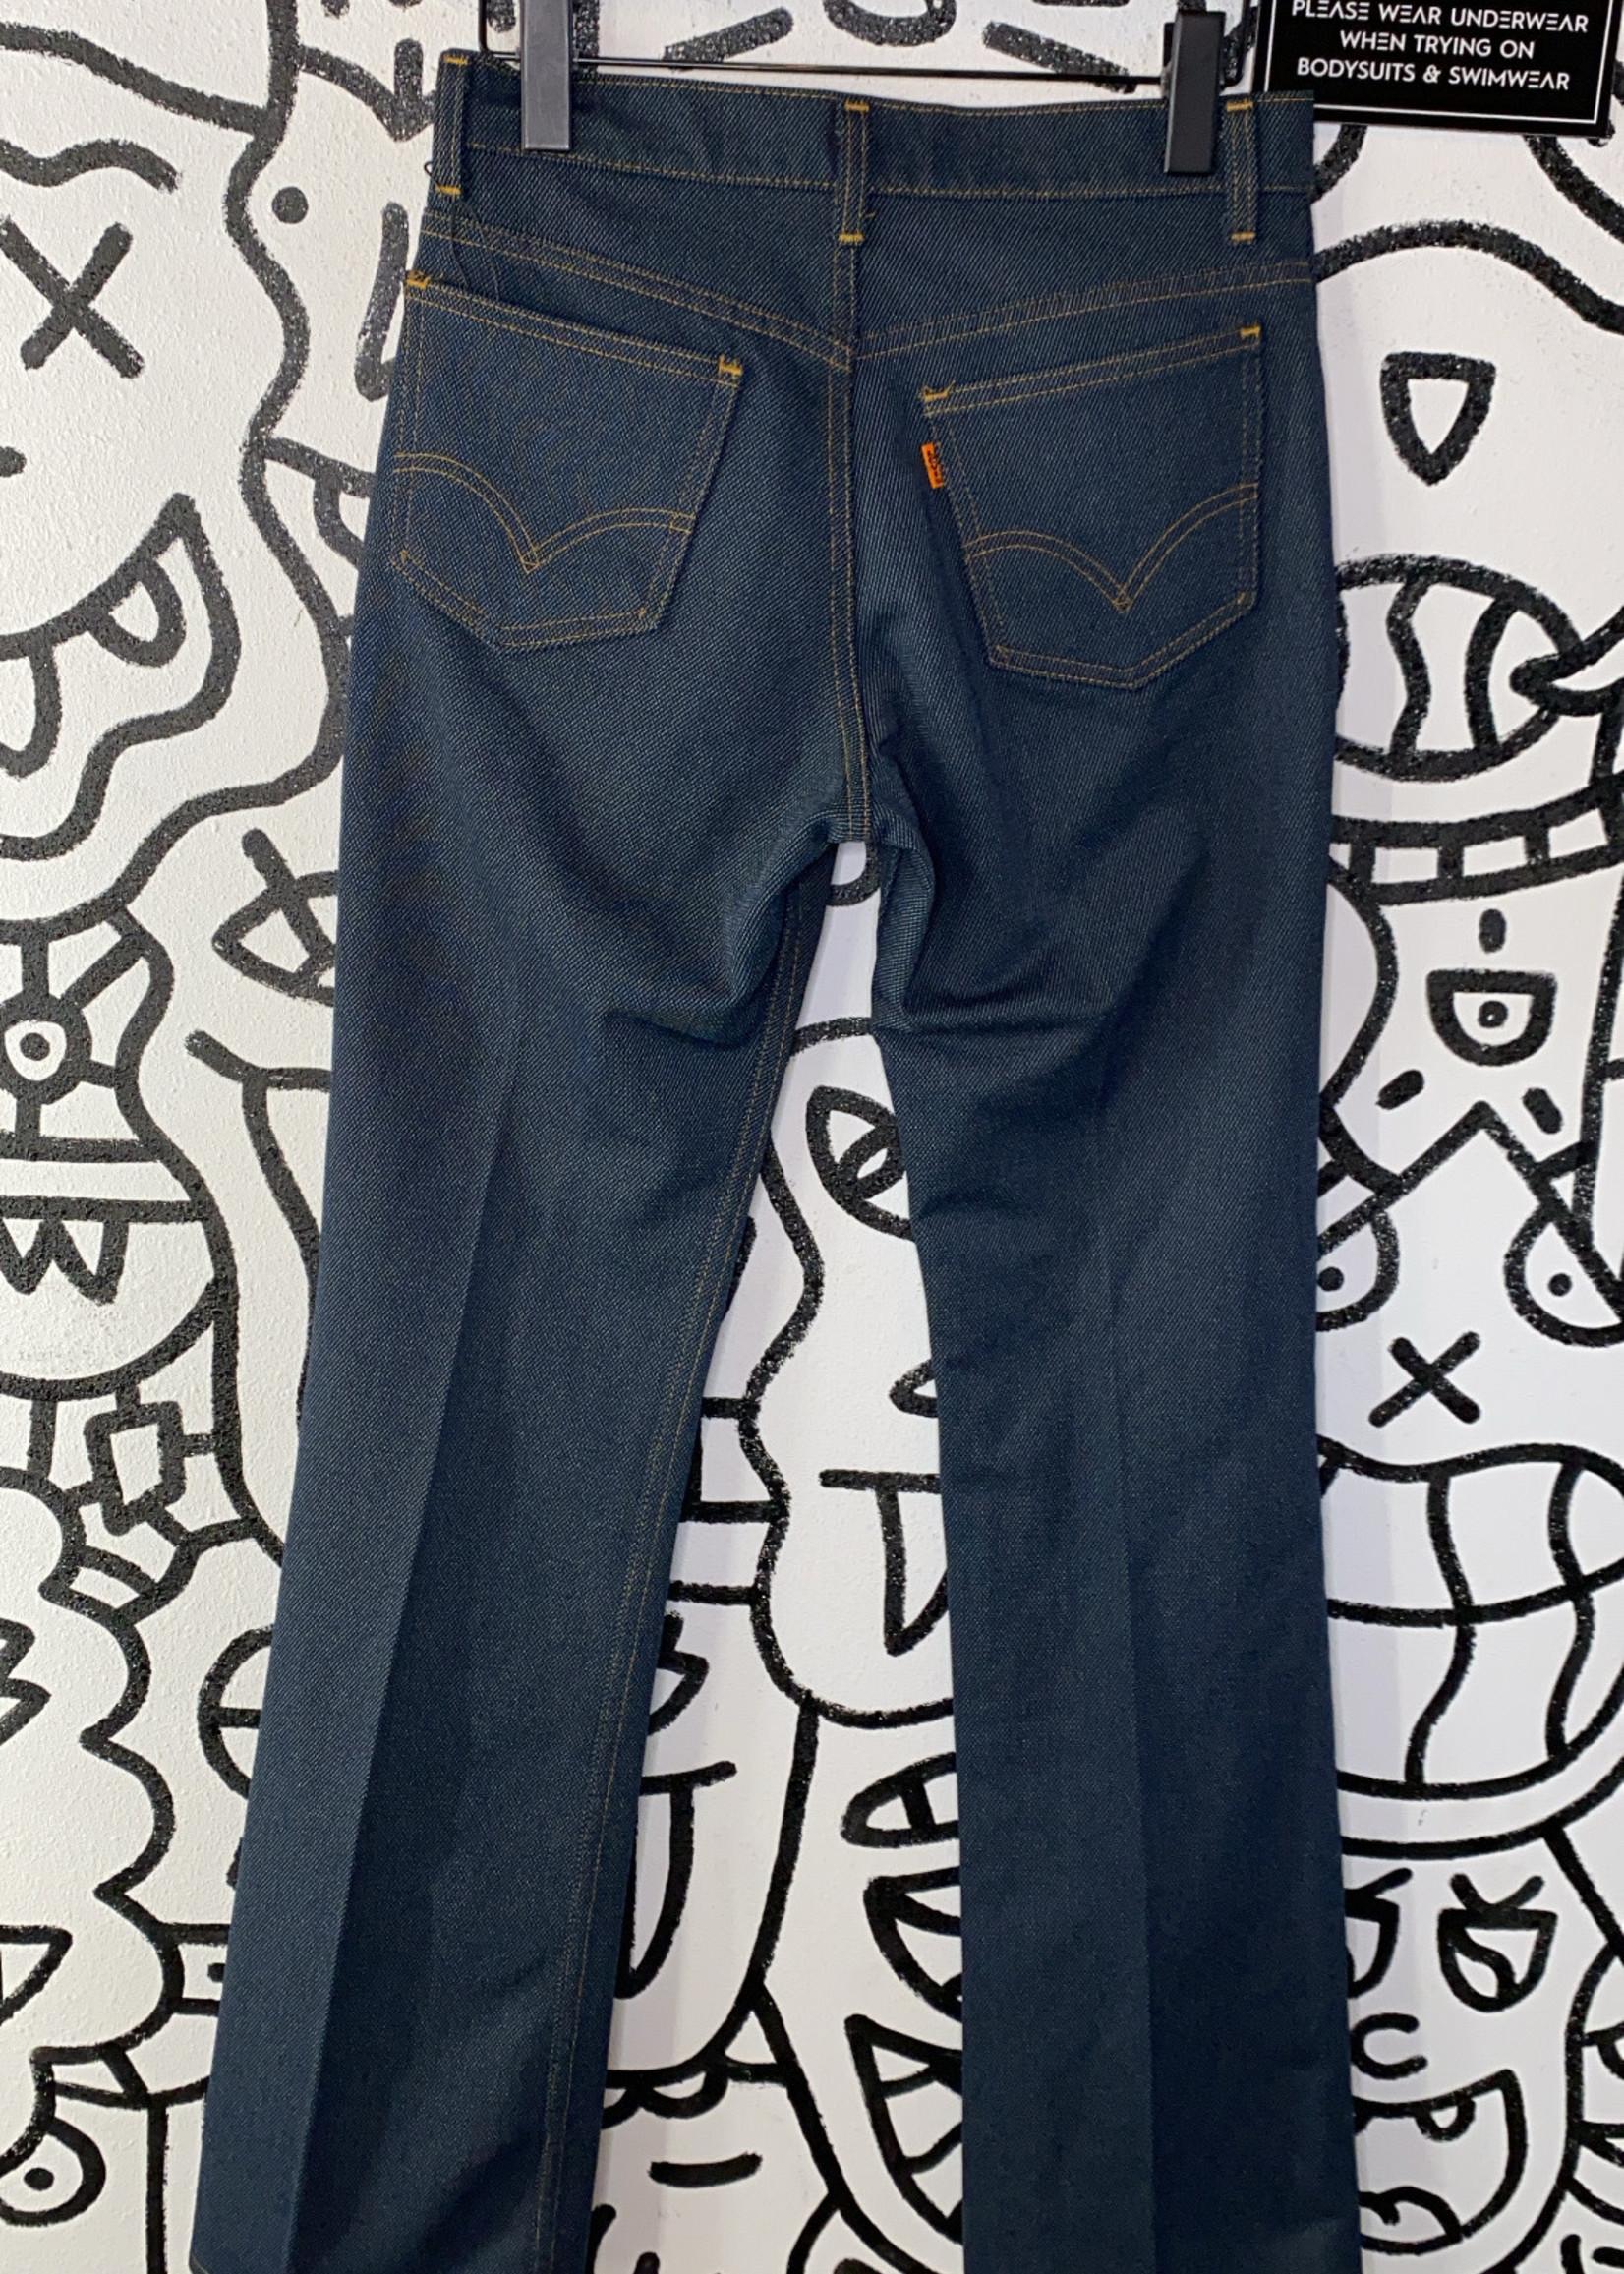 Vintage '80s Levi's orange tag  dark wash denim pants 26